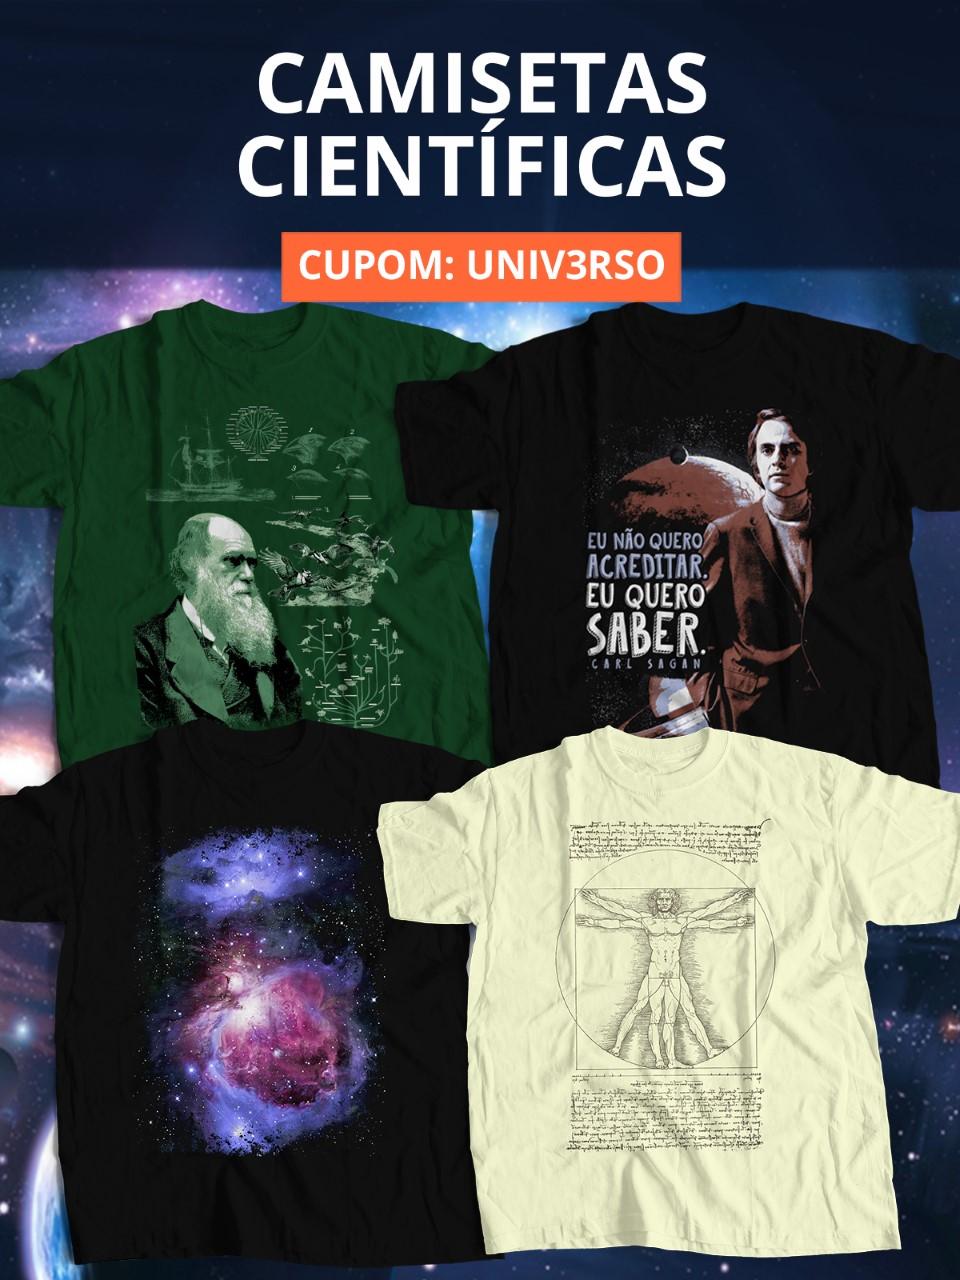 Camisetas científicas